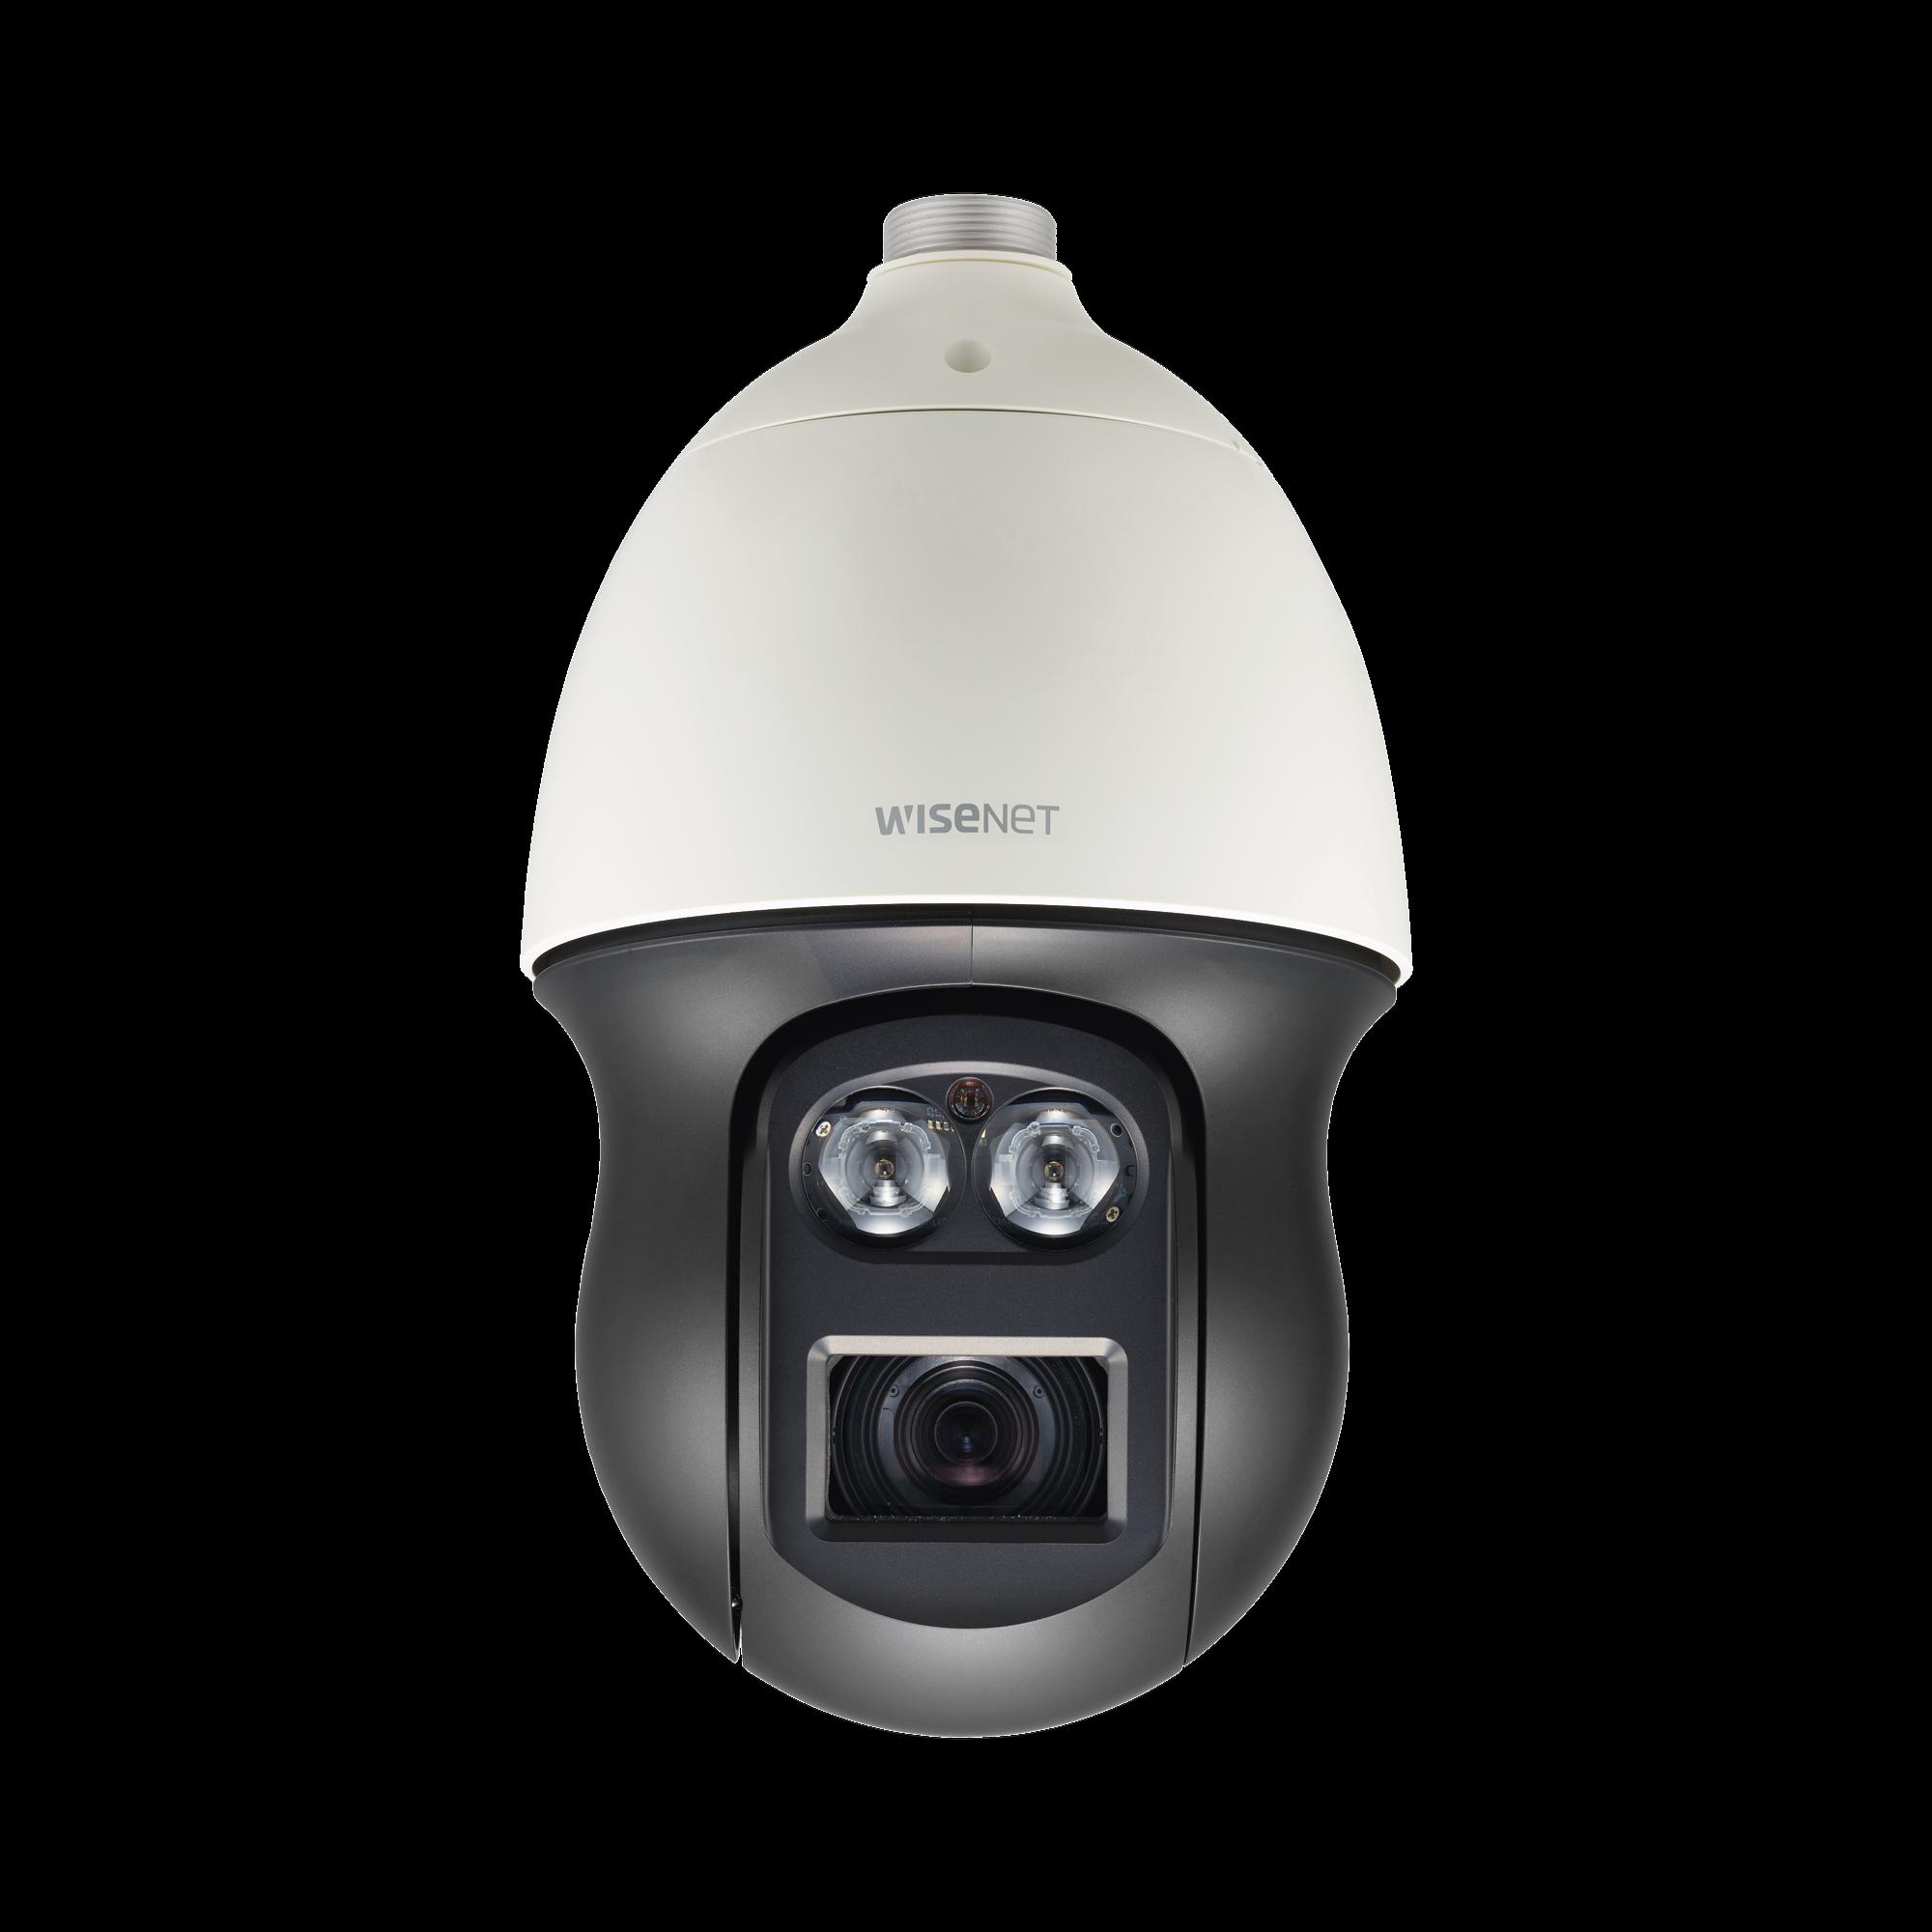 Domo IP PTZ Antivandálico 2MP / Zoom óptico 23X / H.265 & WiseStream  / WDR 120DB / IP66